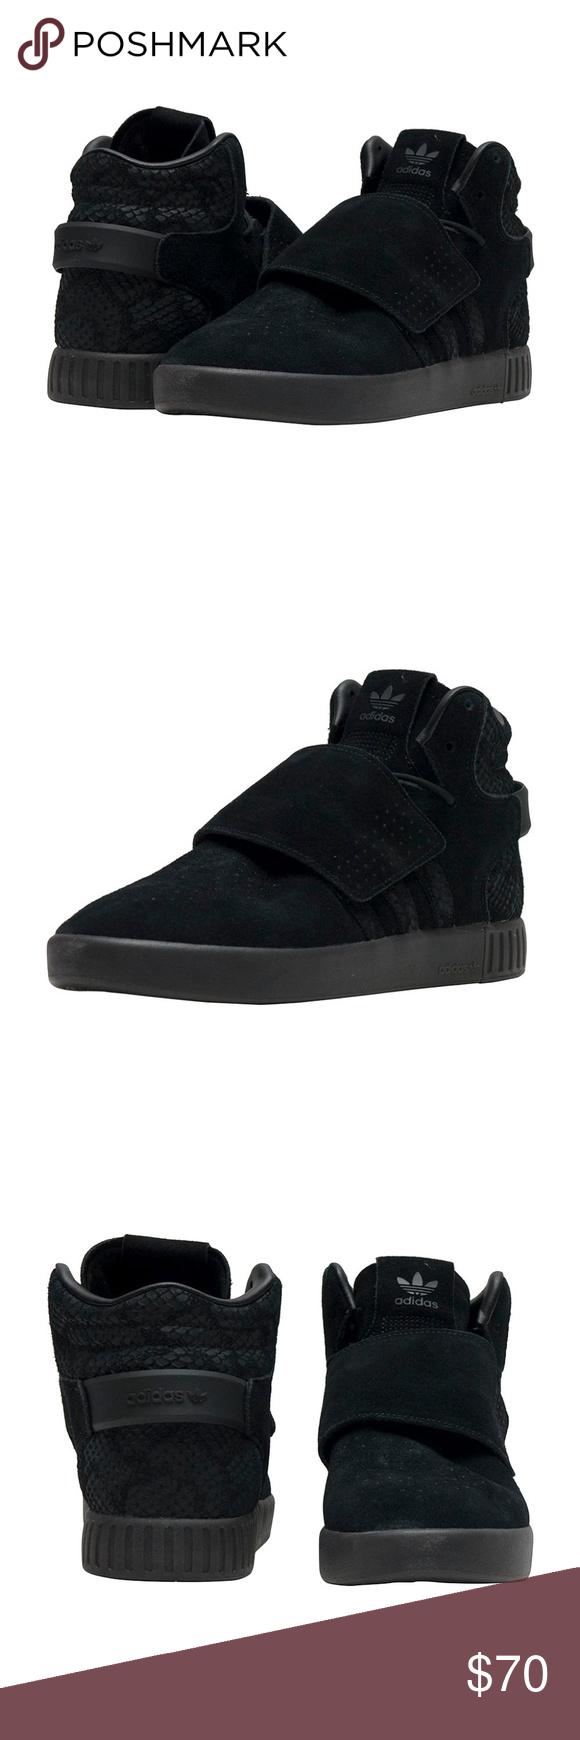 nuove adidas tubulare invasore cinghia j scarpe neri nwt pinterest